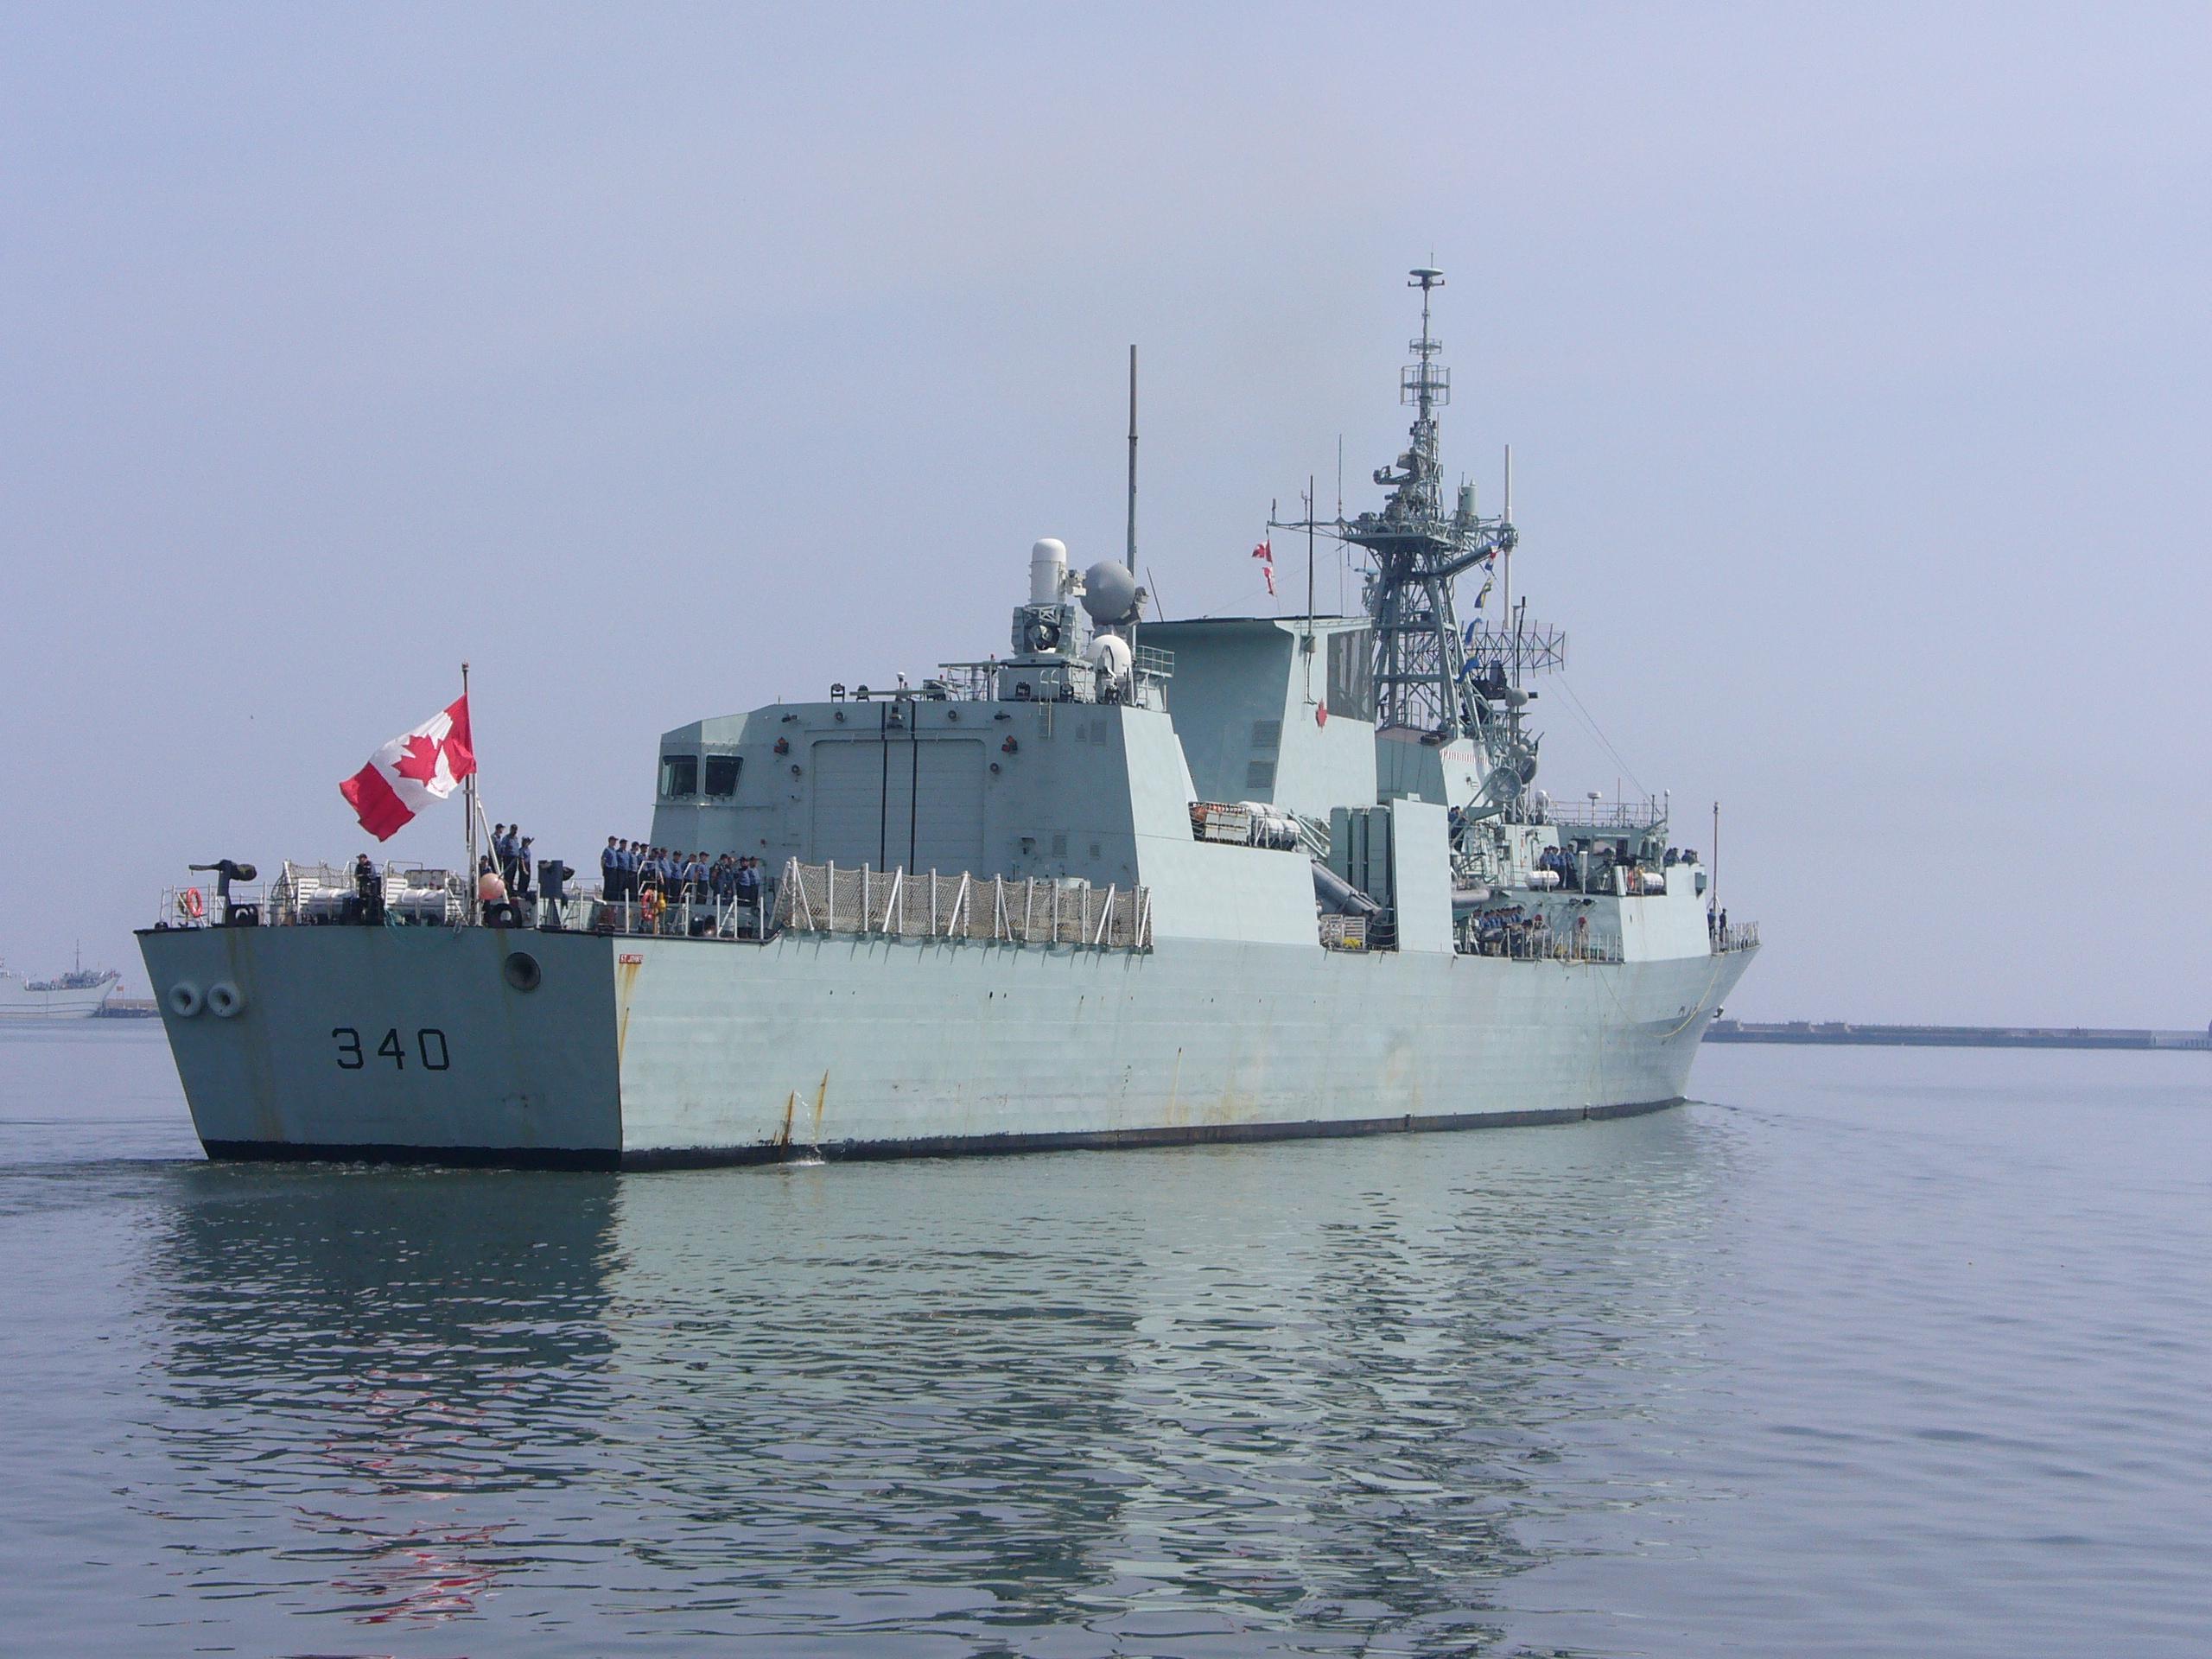 HMCS St. John's to head to Mediterranean Sea to participate in NATO operation